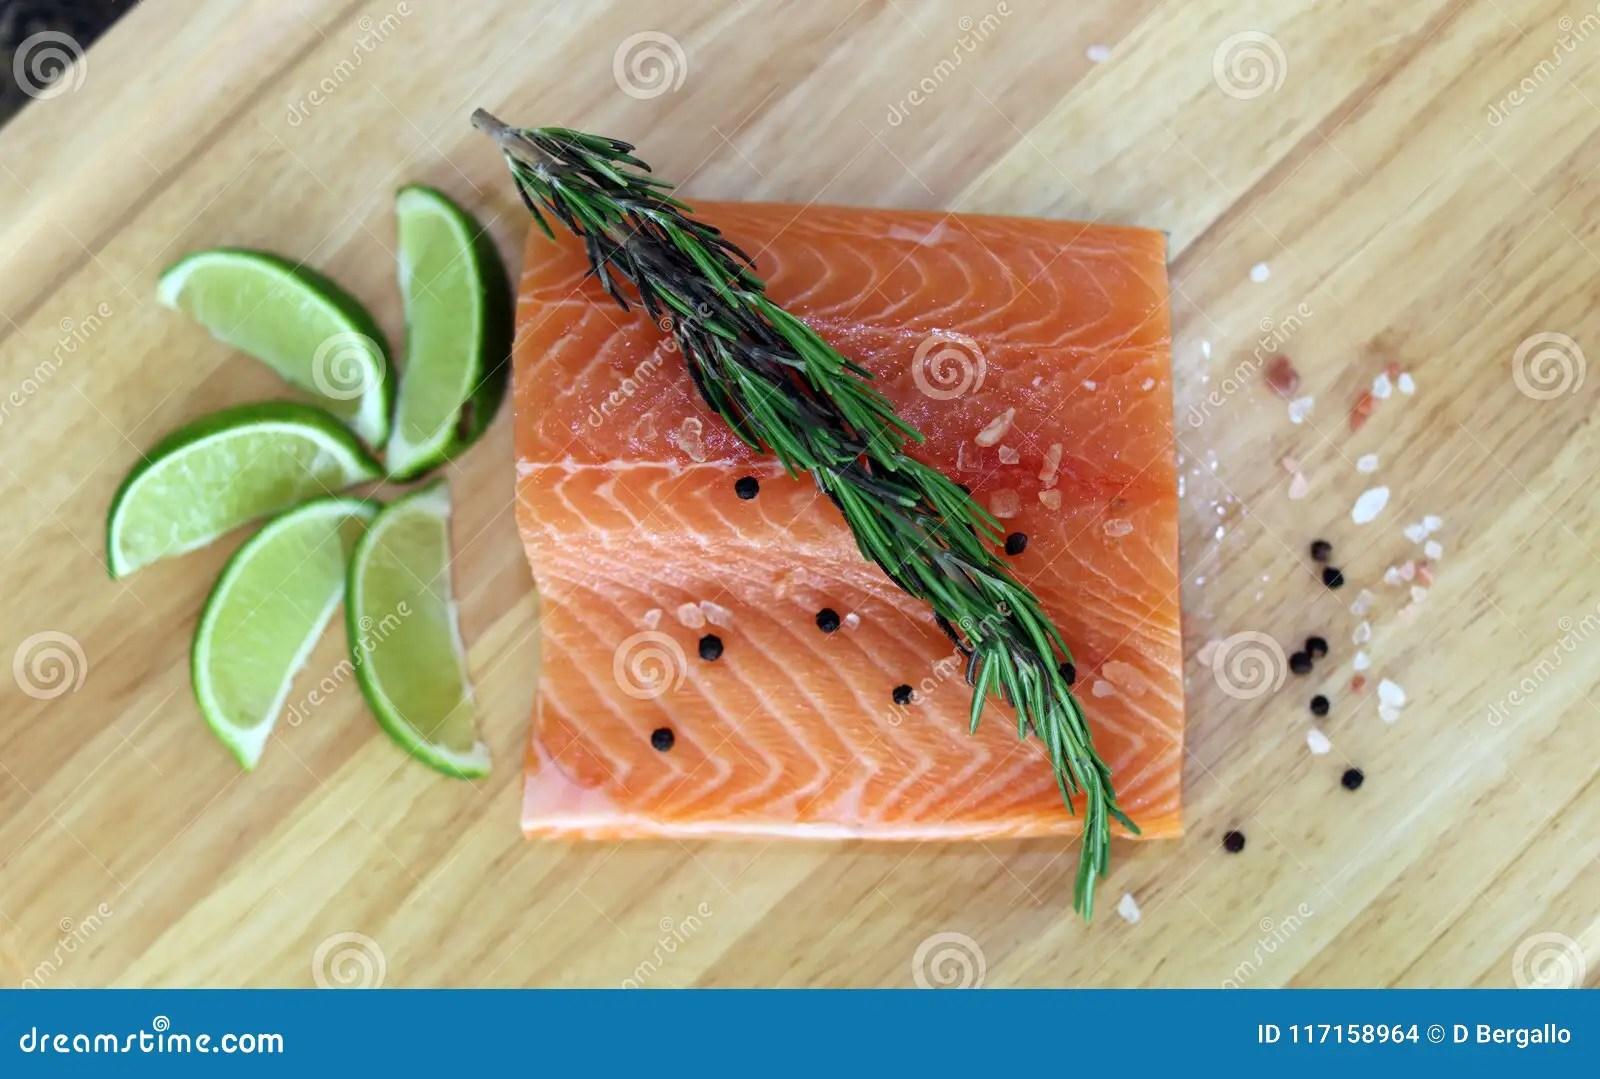 kitchen prep table sears appliances 木切板在与新鲜的红鲑鱼的厨房用桌里钓鱼盐胡椒并且撒石灰准备好烹调库存 木切板在与新鲜的红鲑鱼的厨房用桌里钓鱼盐胡椒并且撒石灰准备好烹调新烹调元素用准备好的厨师的健康食物烹调